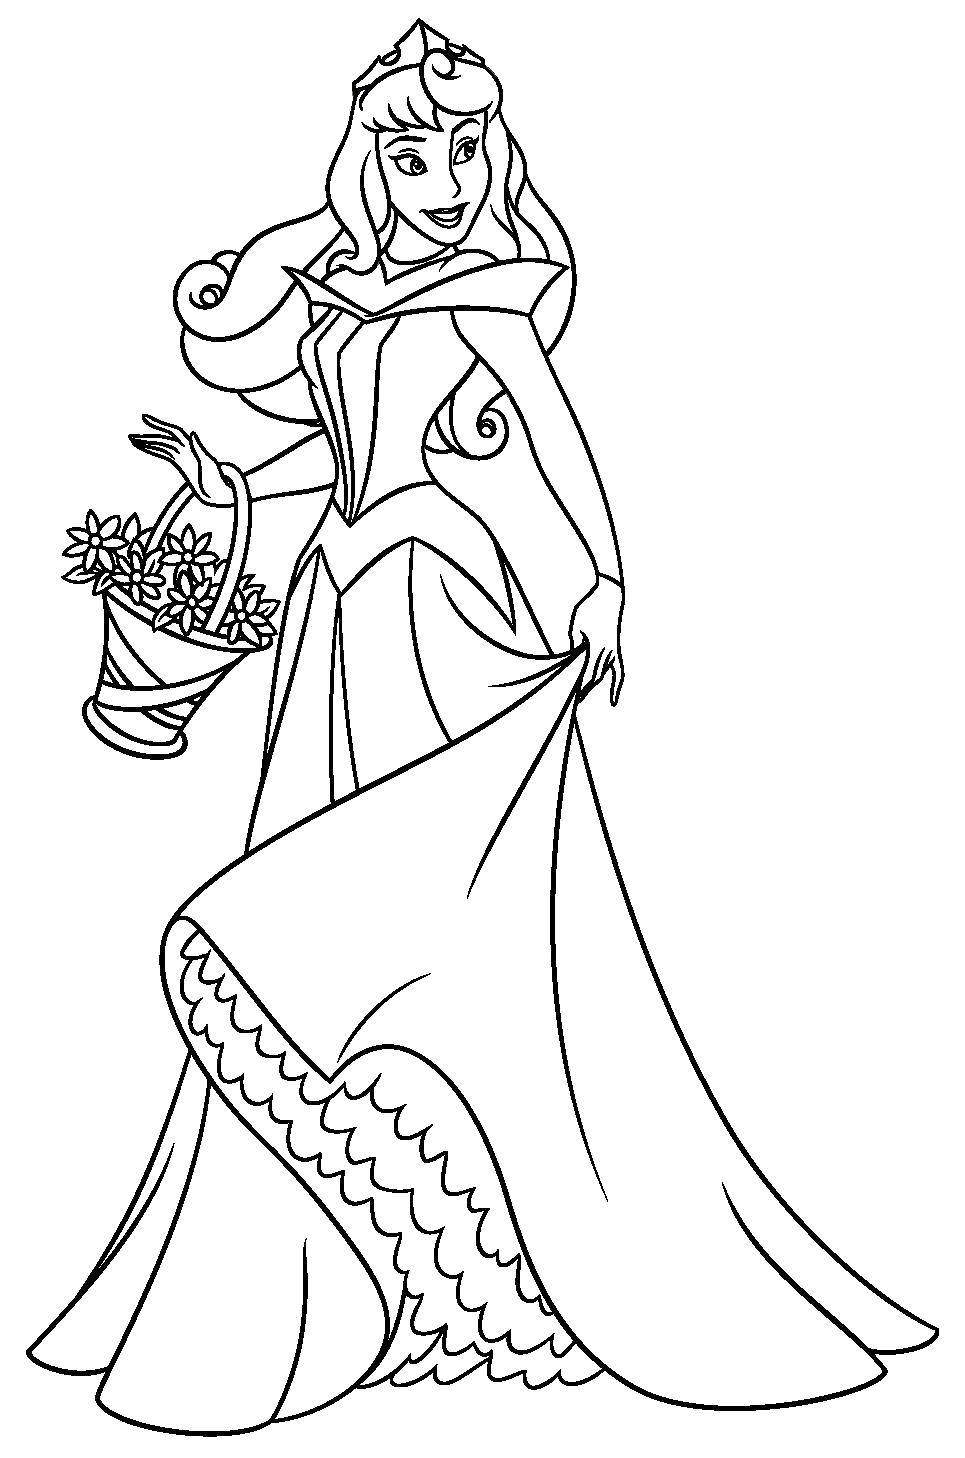 Название: Раскраска Красавица аврора. Категория: спящая красавица. Теги: Дисней, Спящая красавица.